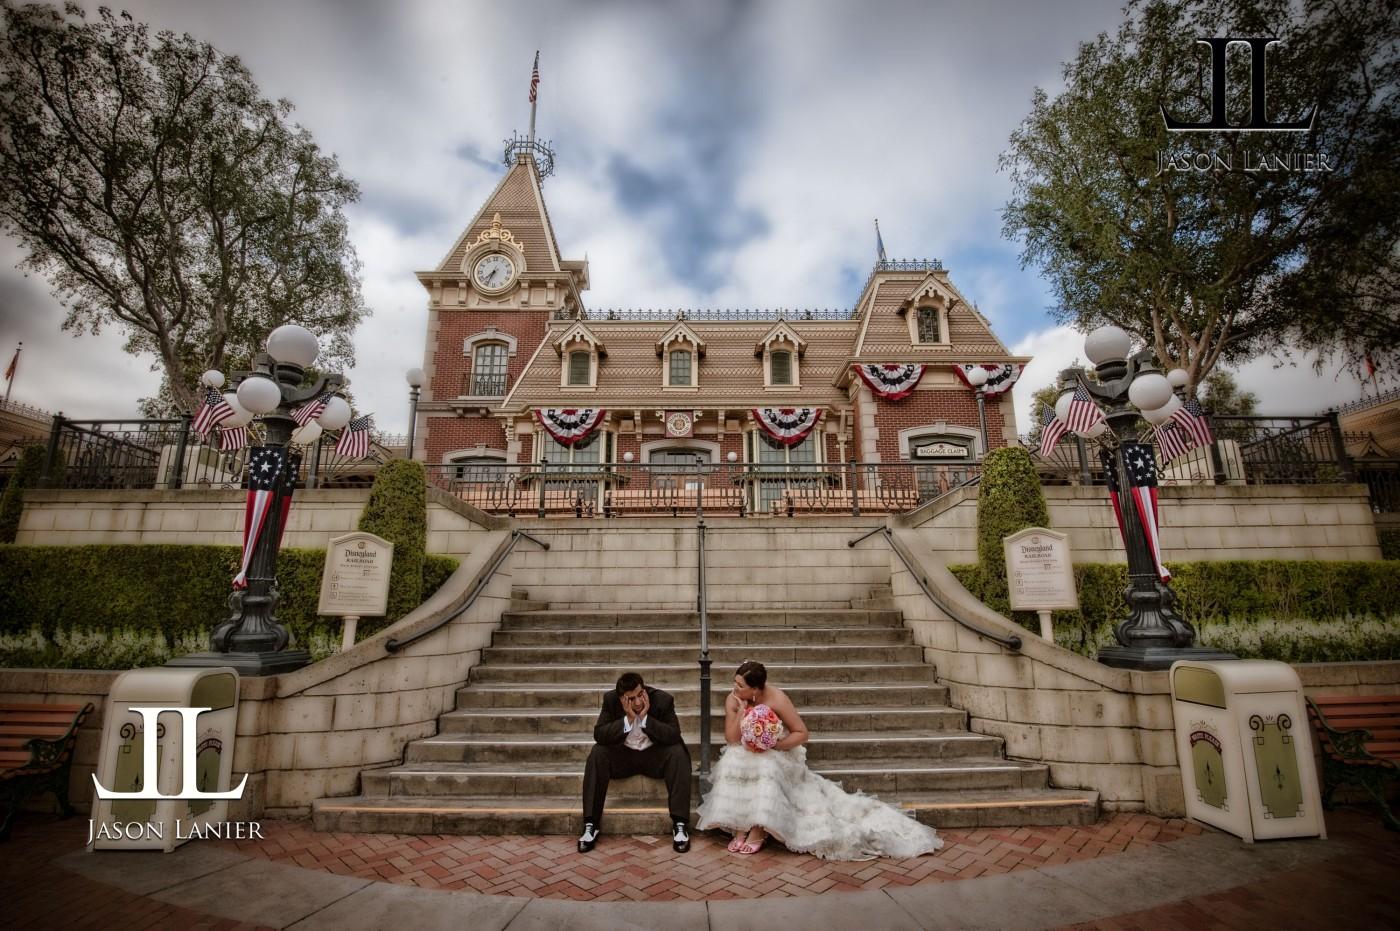 Jason Lanier Photography Featured on Disney's Fairy Tale Weddings